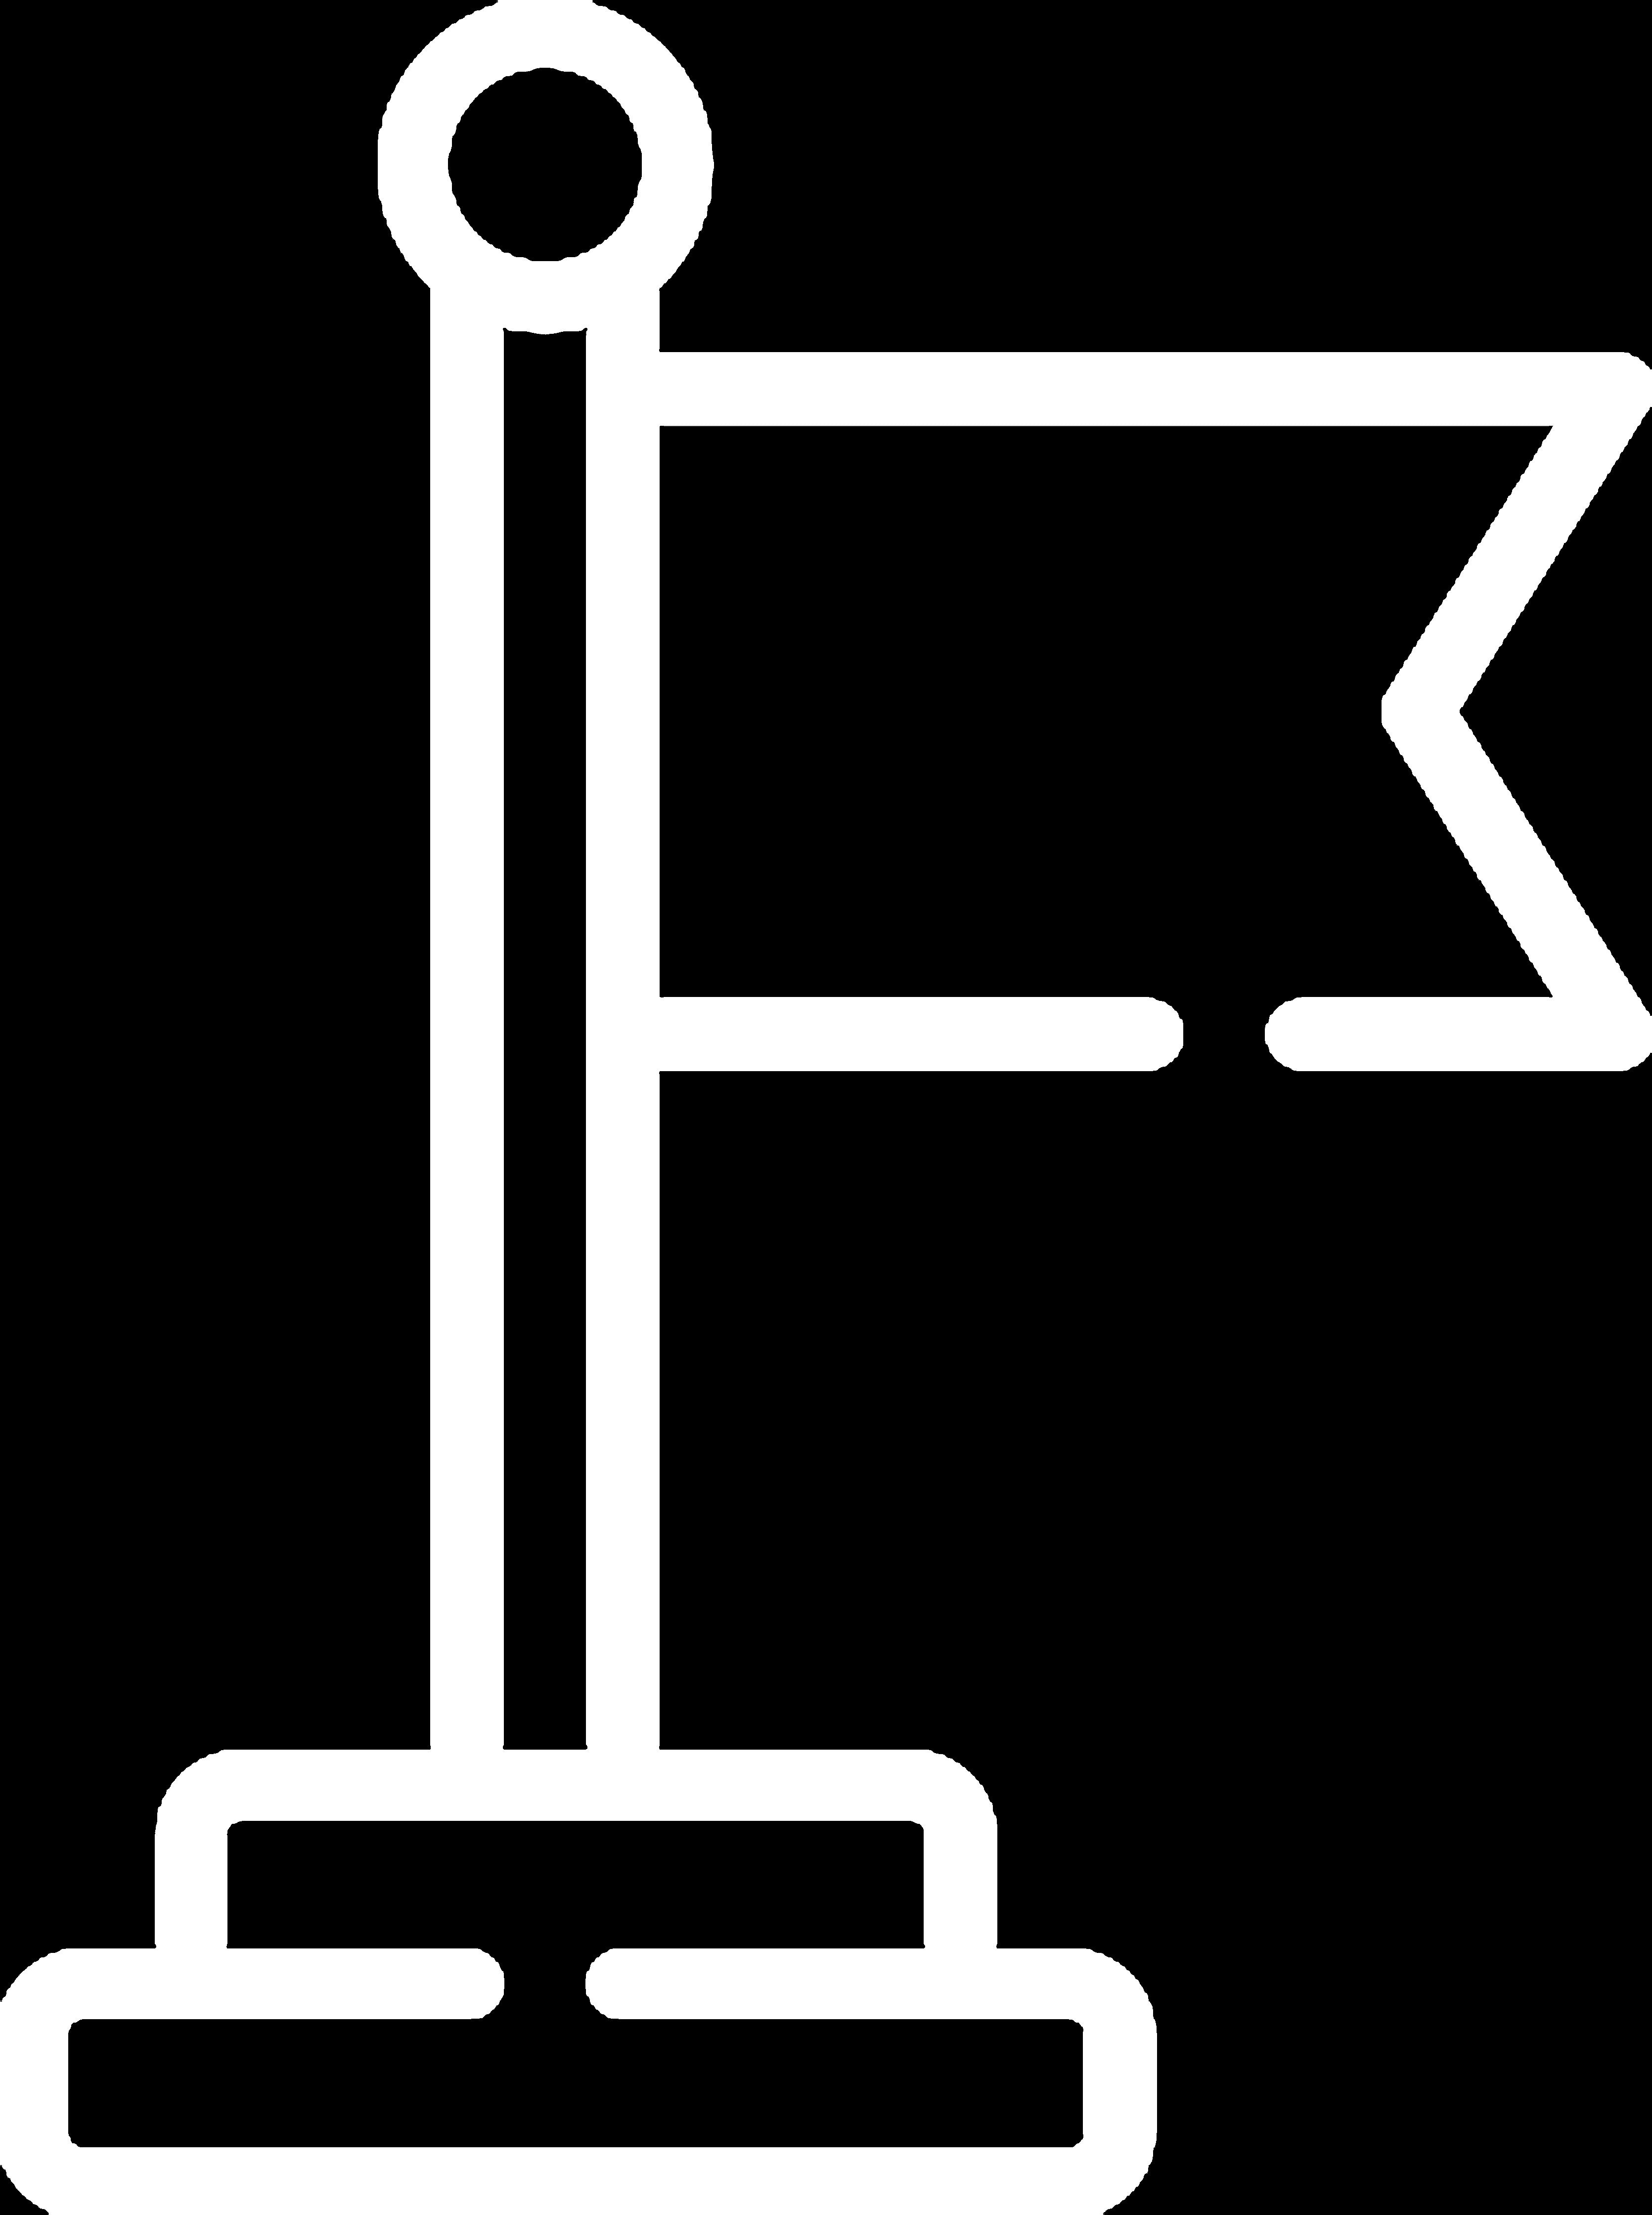 icone 6